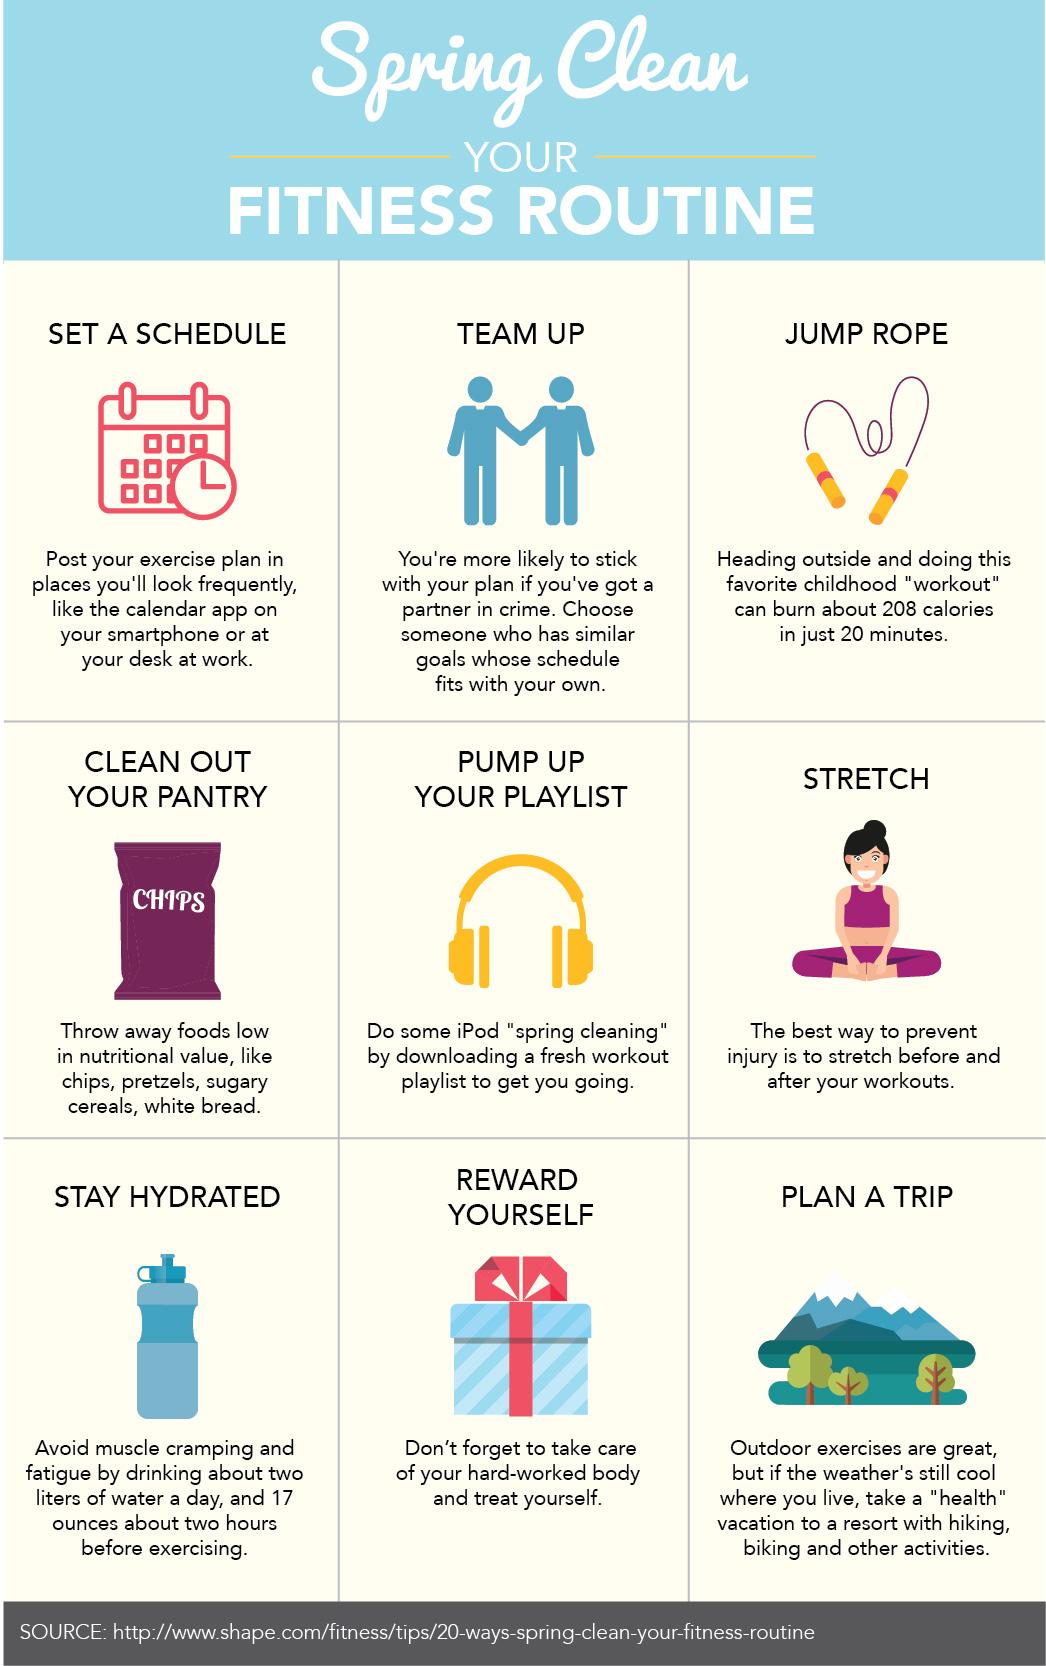 5 training tips for spring sports brand spotlight story